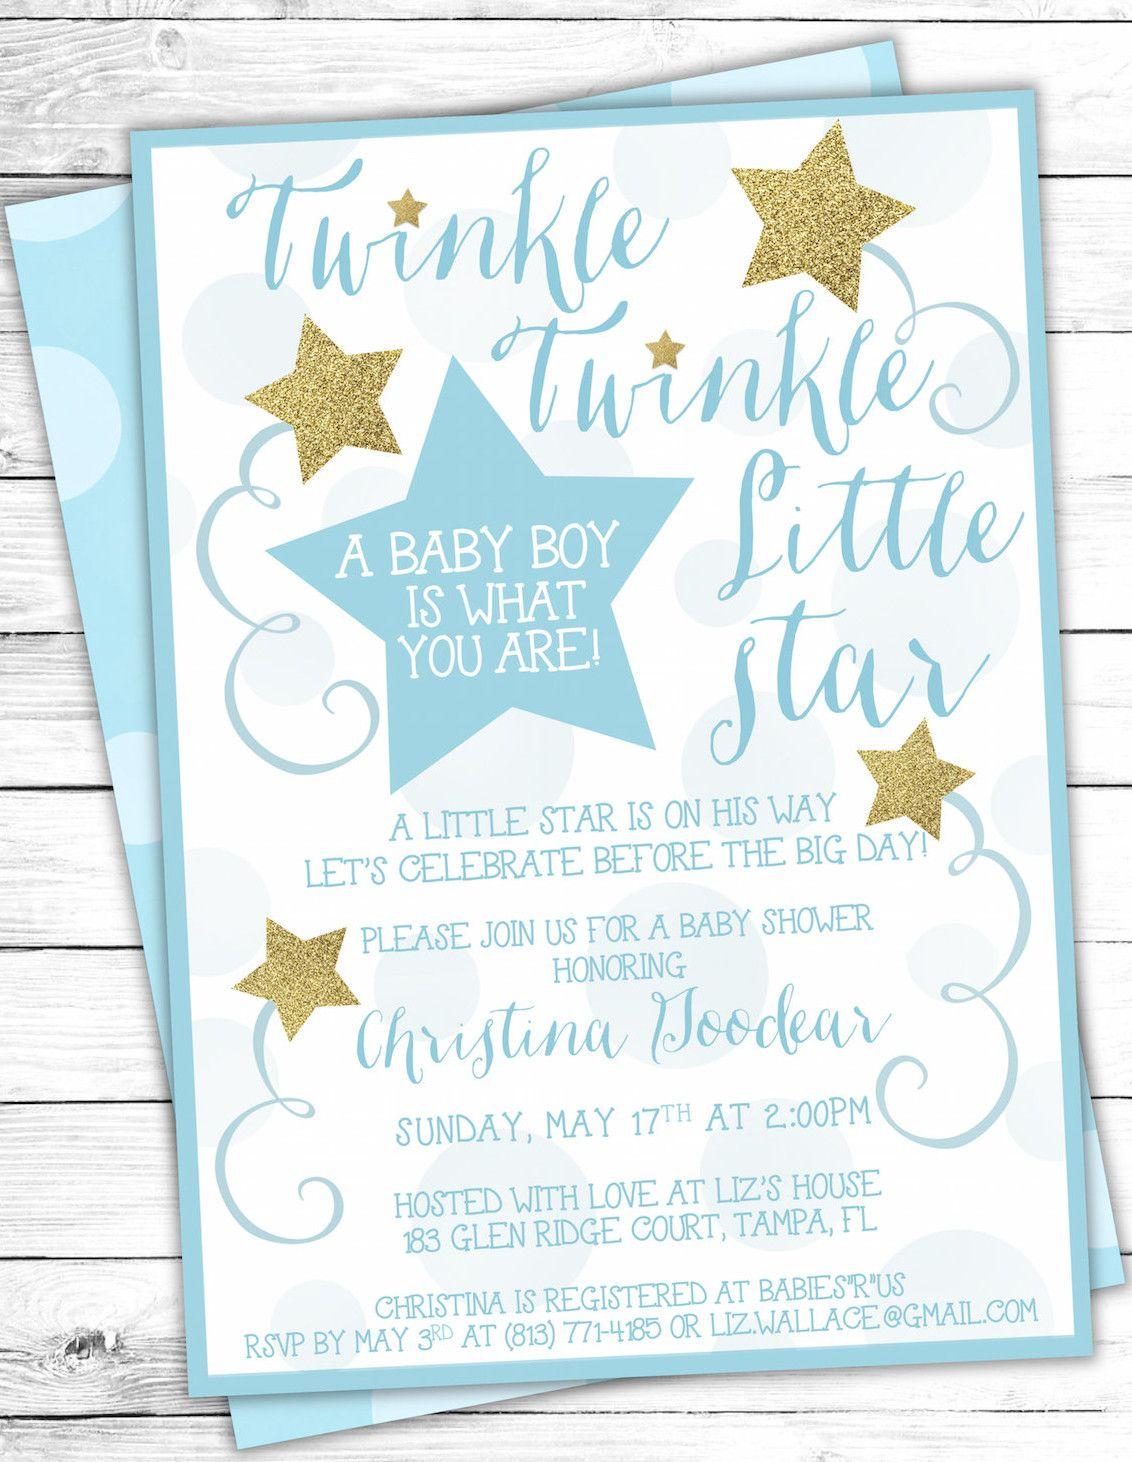 Le Little Star Party Theme Planning Ideas